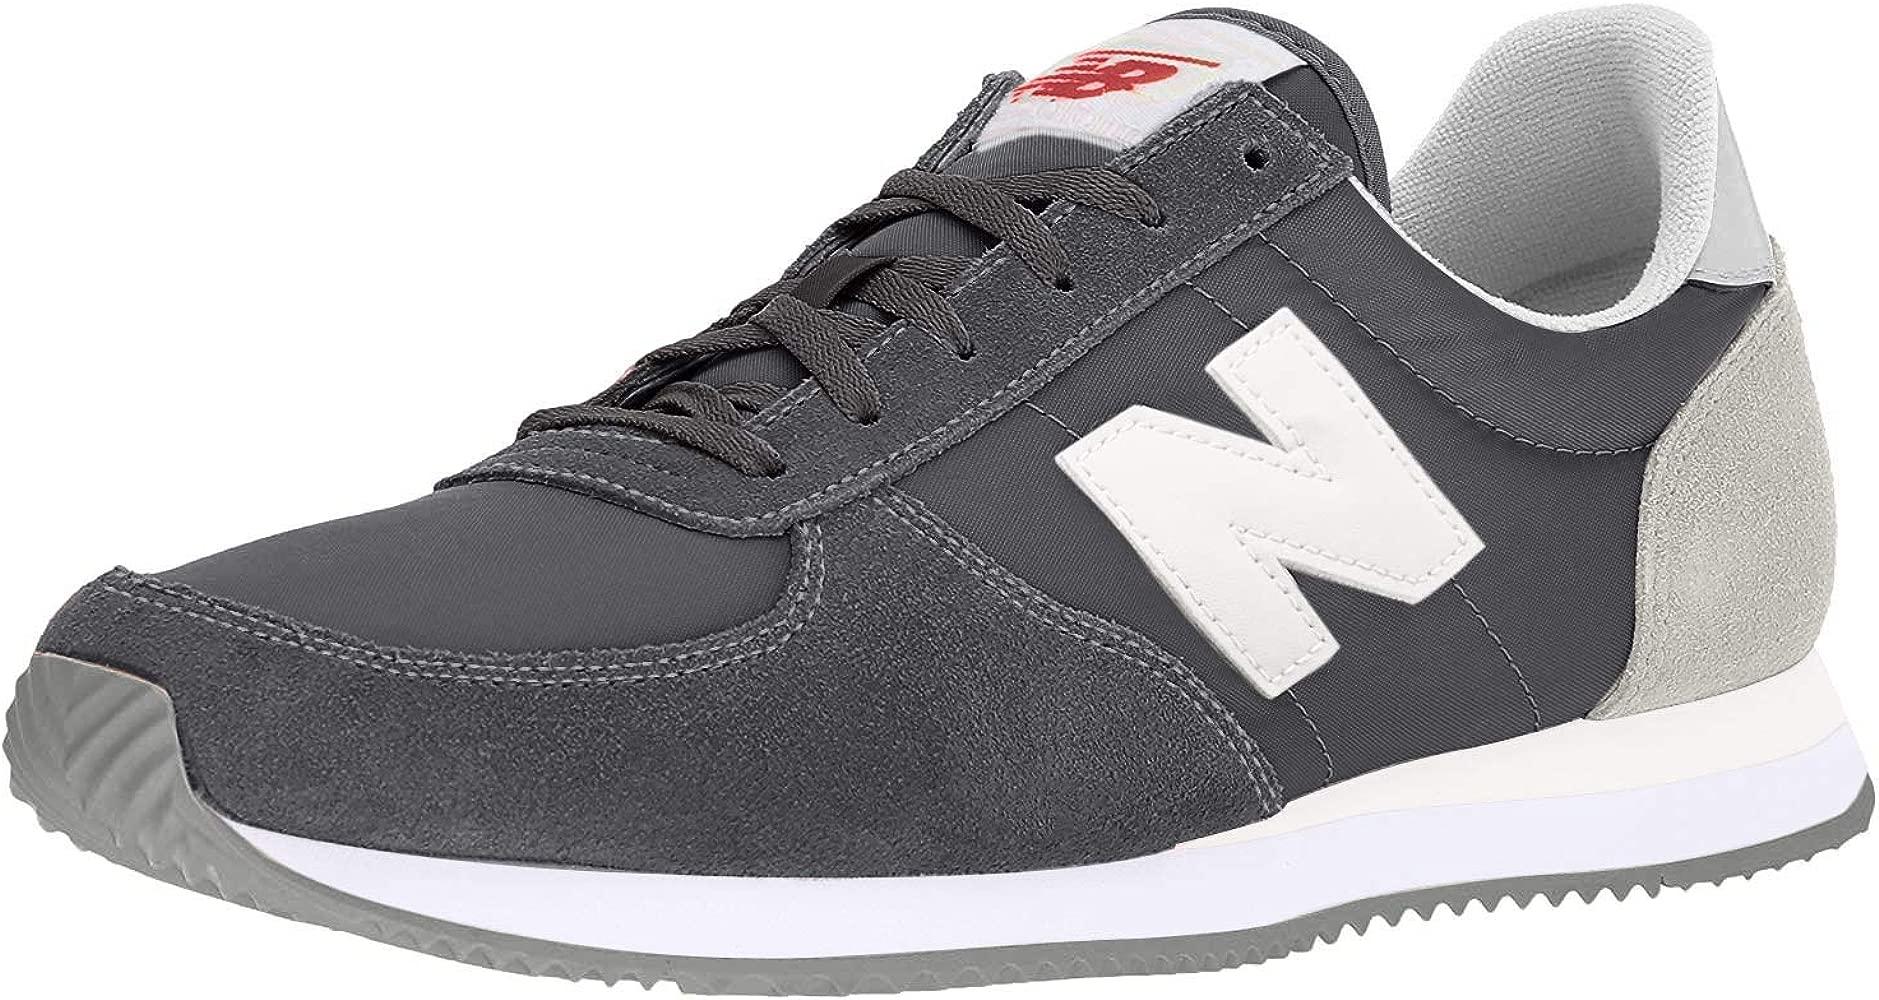 New Balance Wl220v1, Zapatillas para Mujer